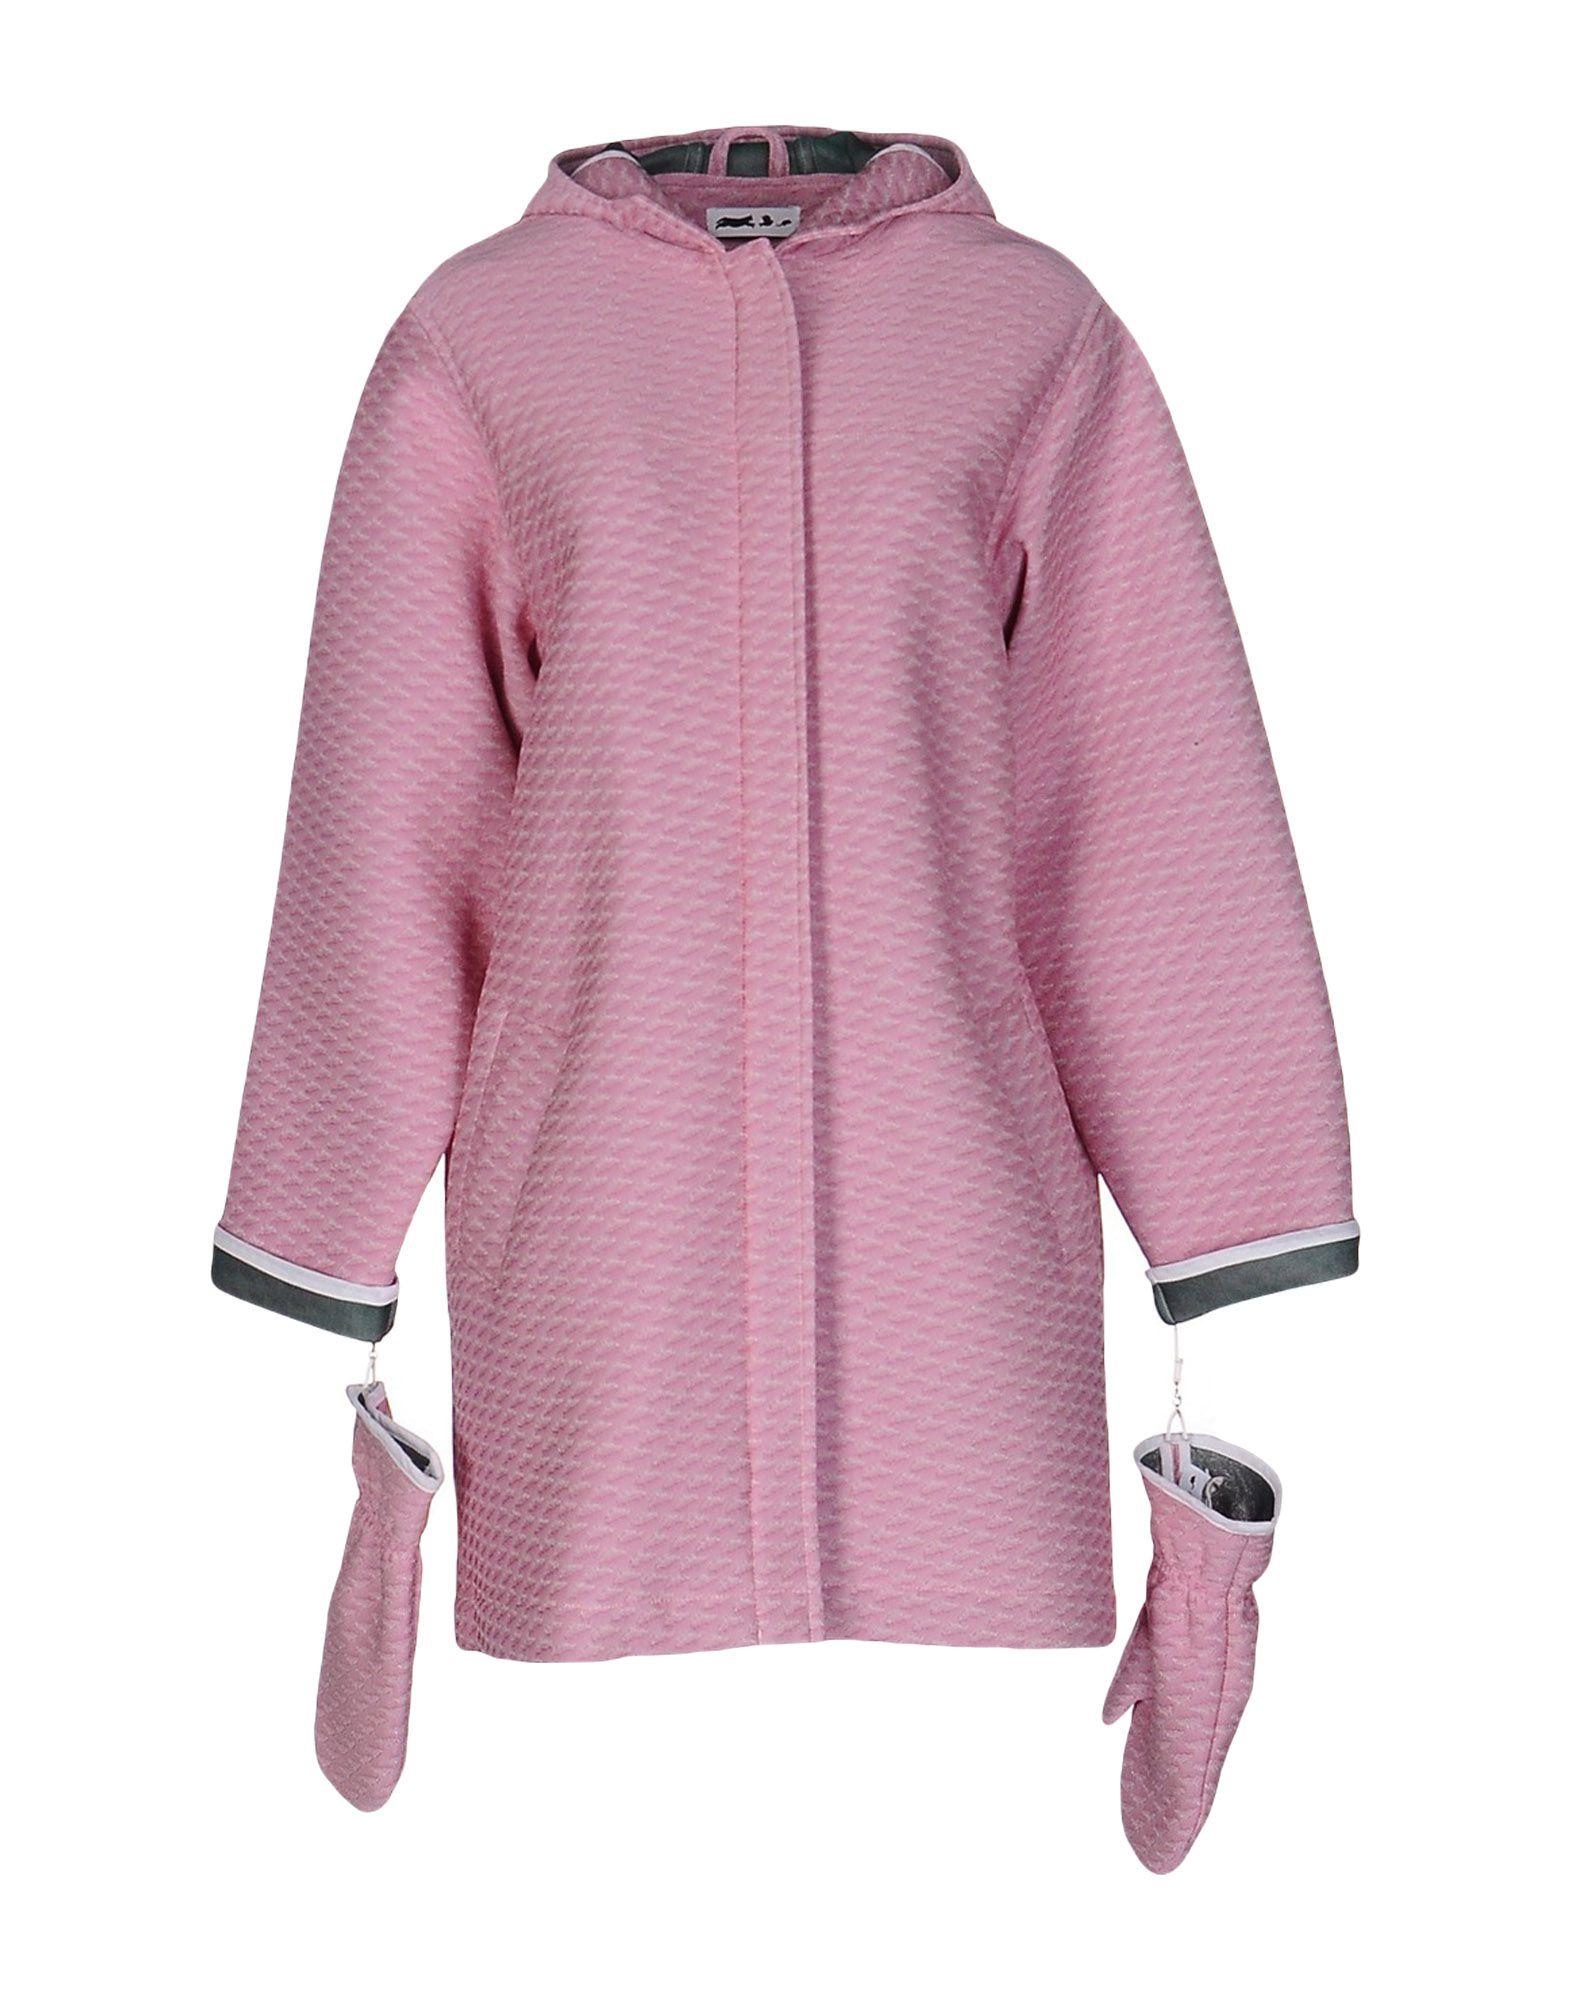 LEO Full-Length Jacket in Pink